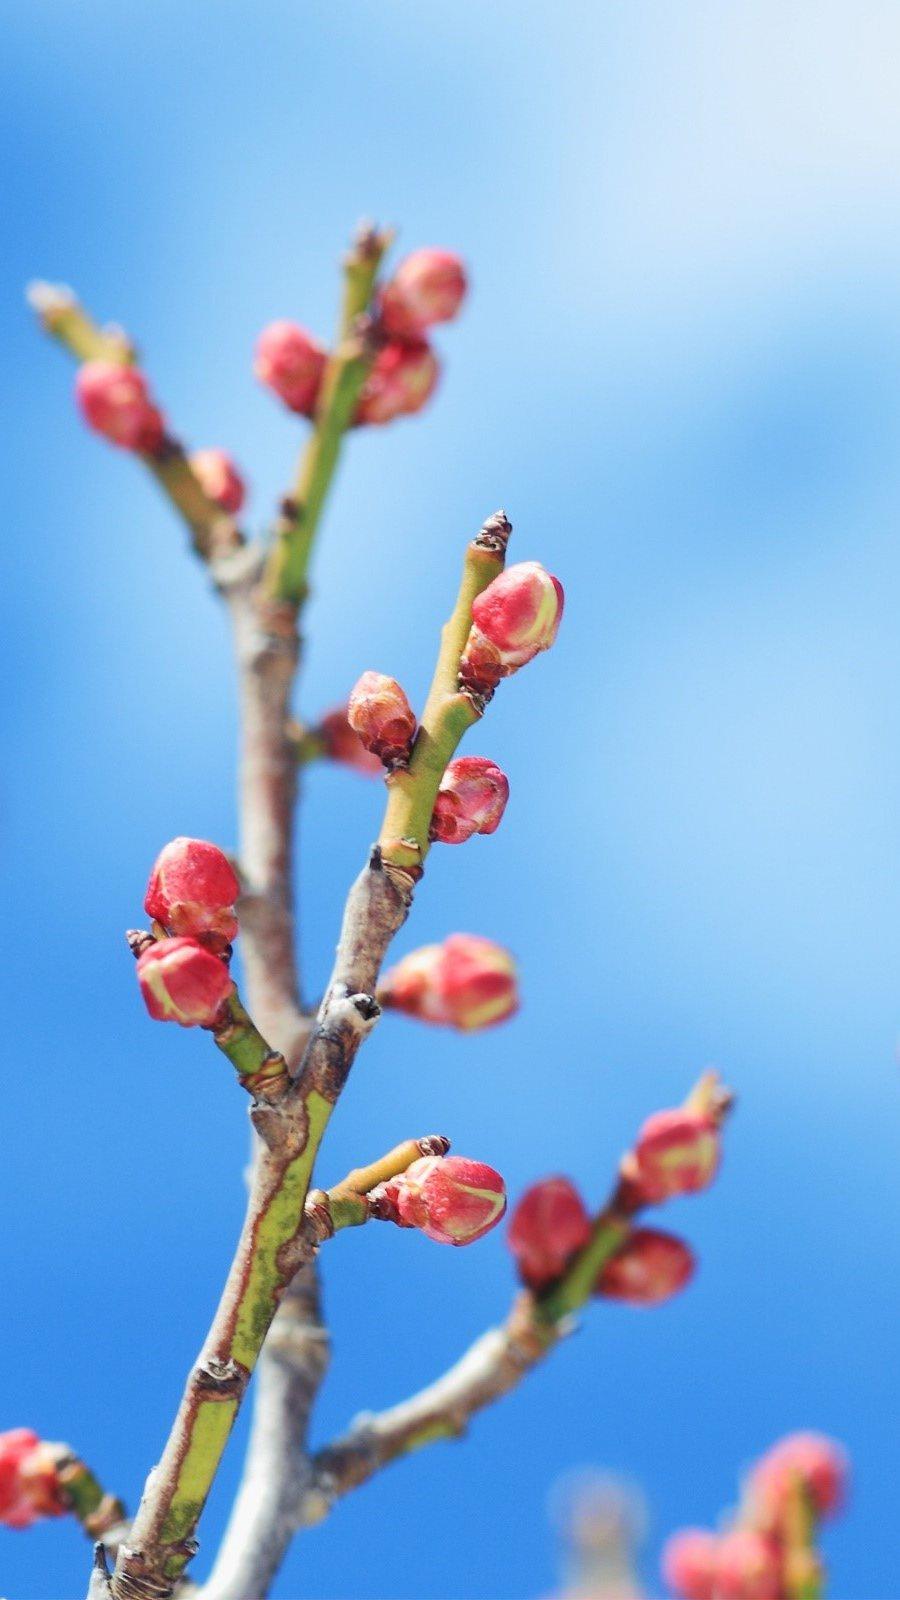 Wallpaper Floral buds Vertical